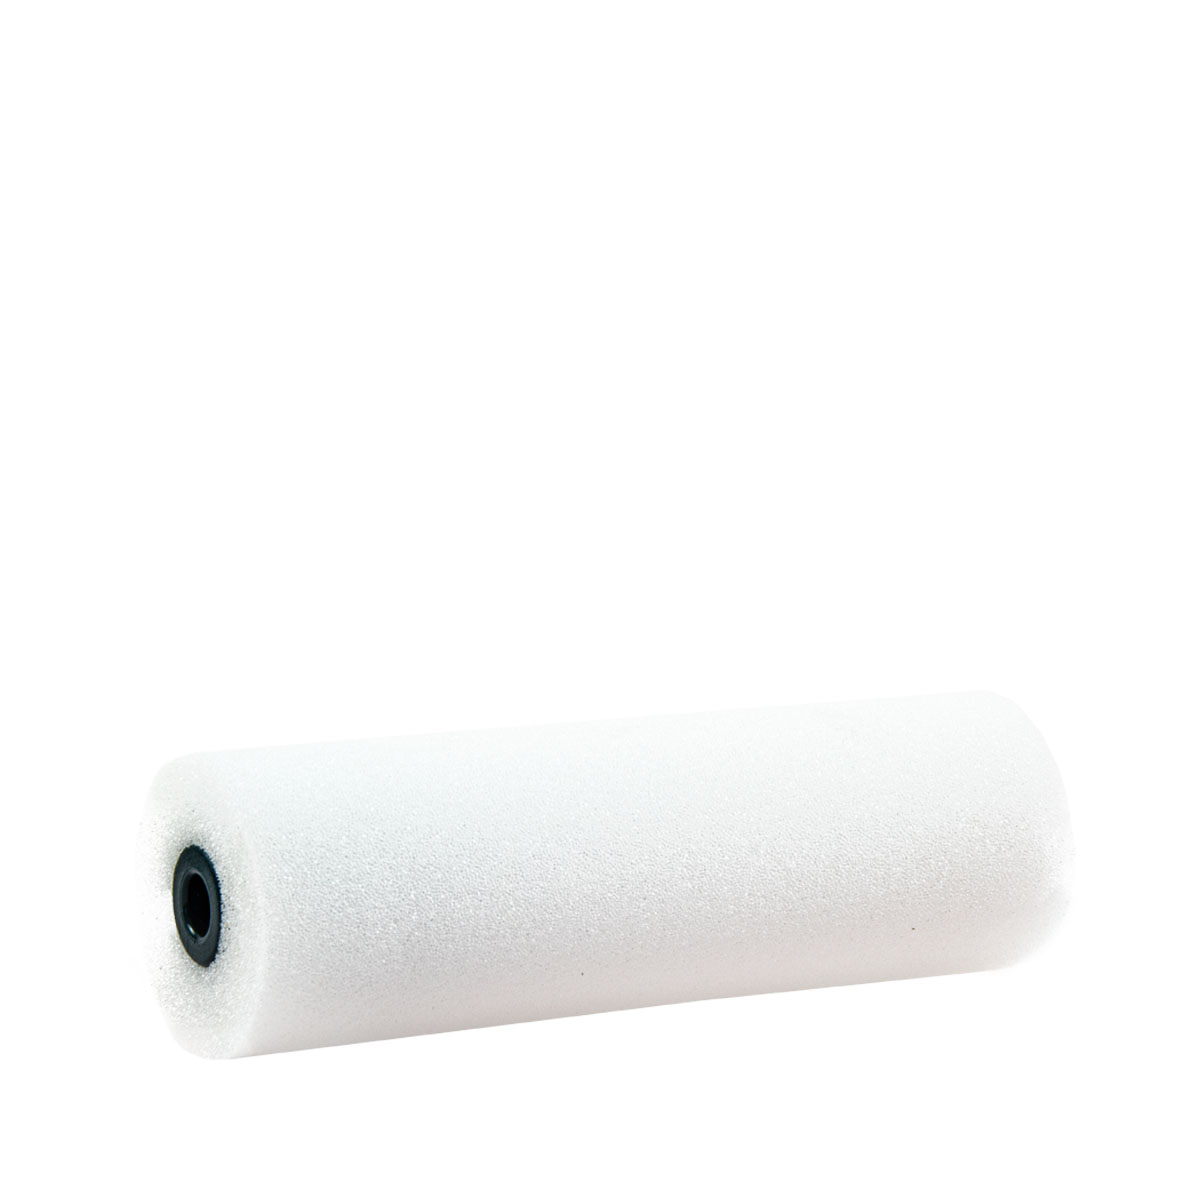 Schaumstoff Superfein Heizkörperwalze, 11 cm , versch Ausführungen